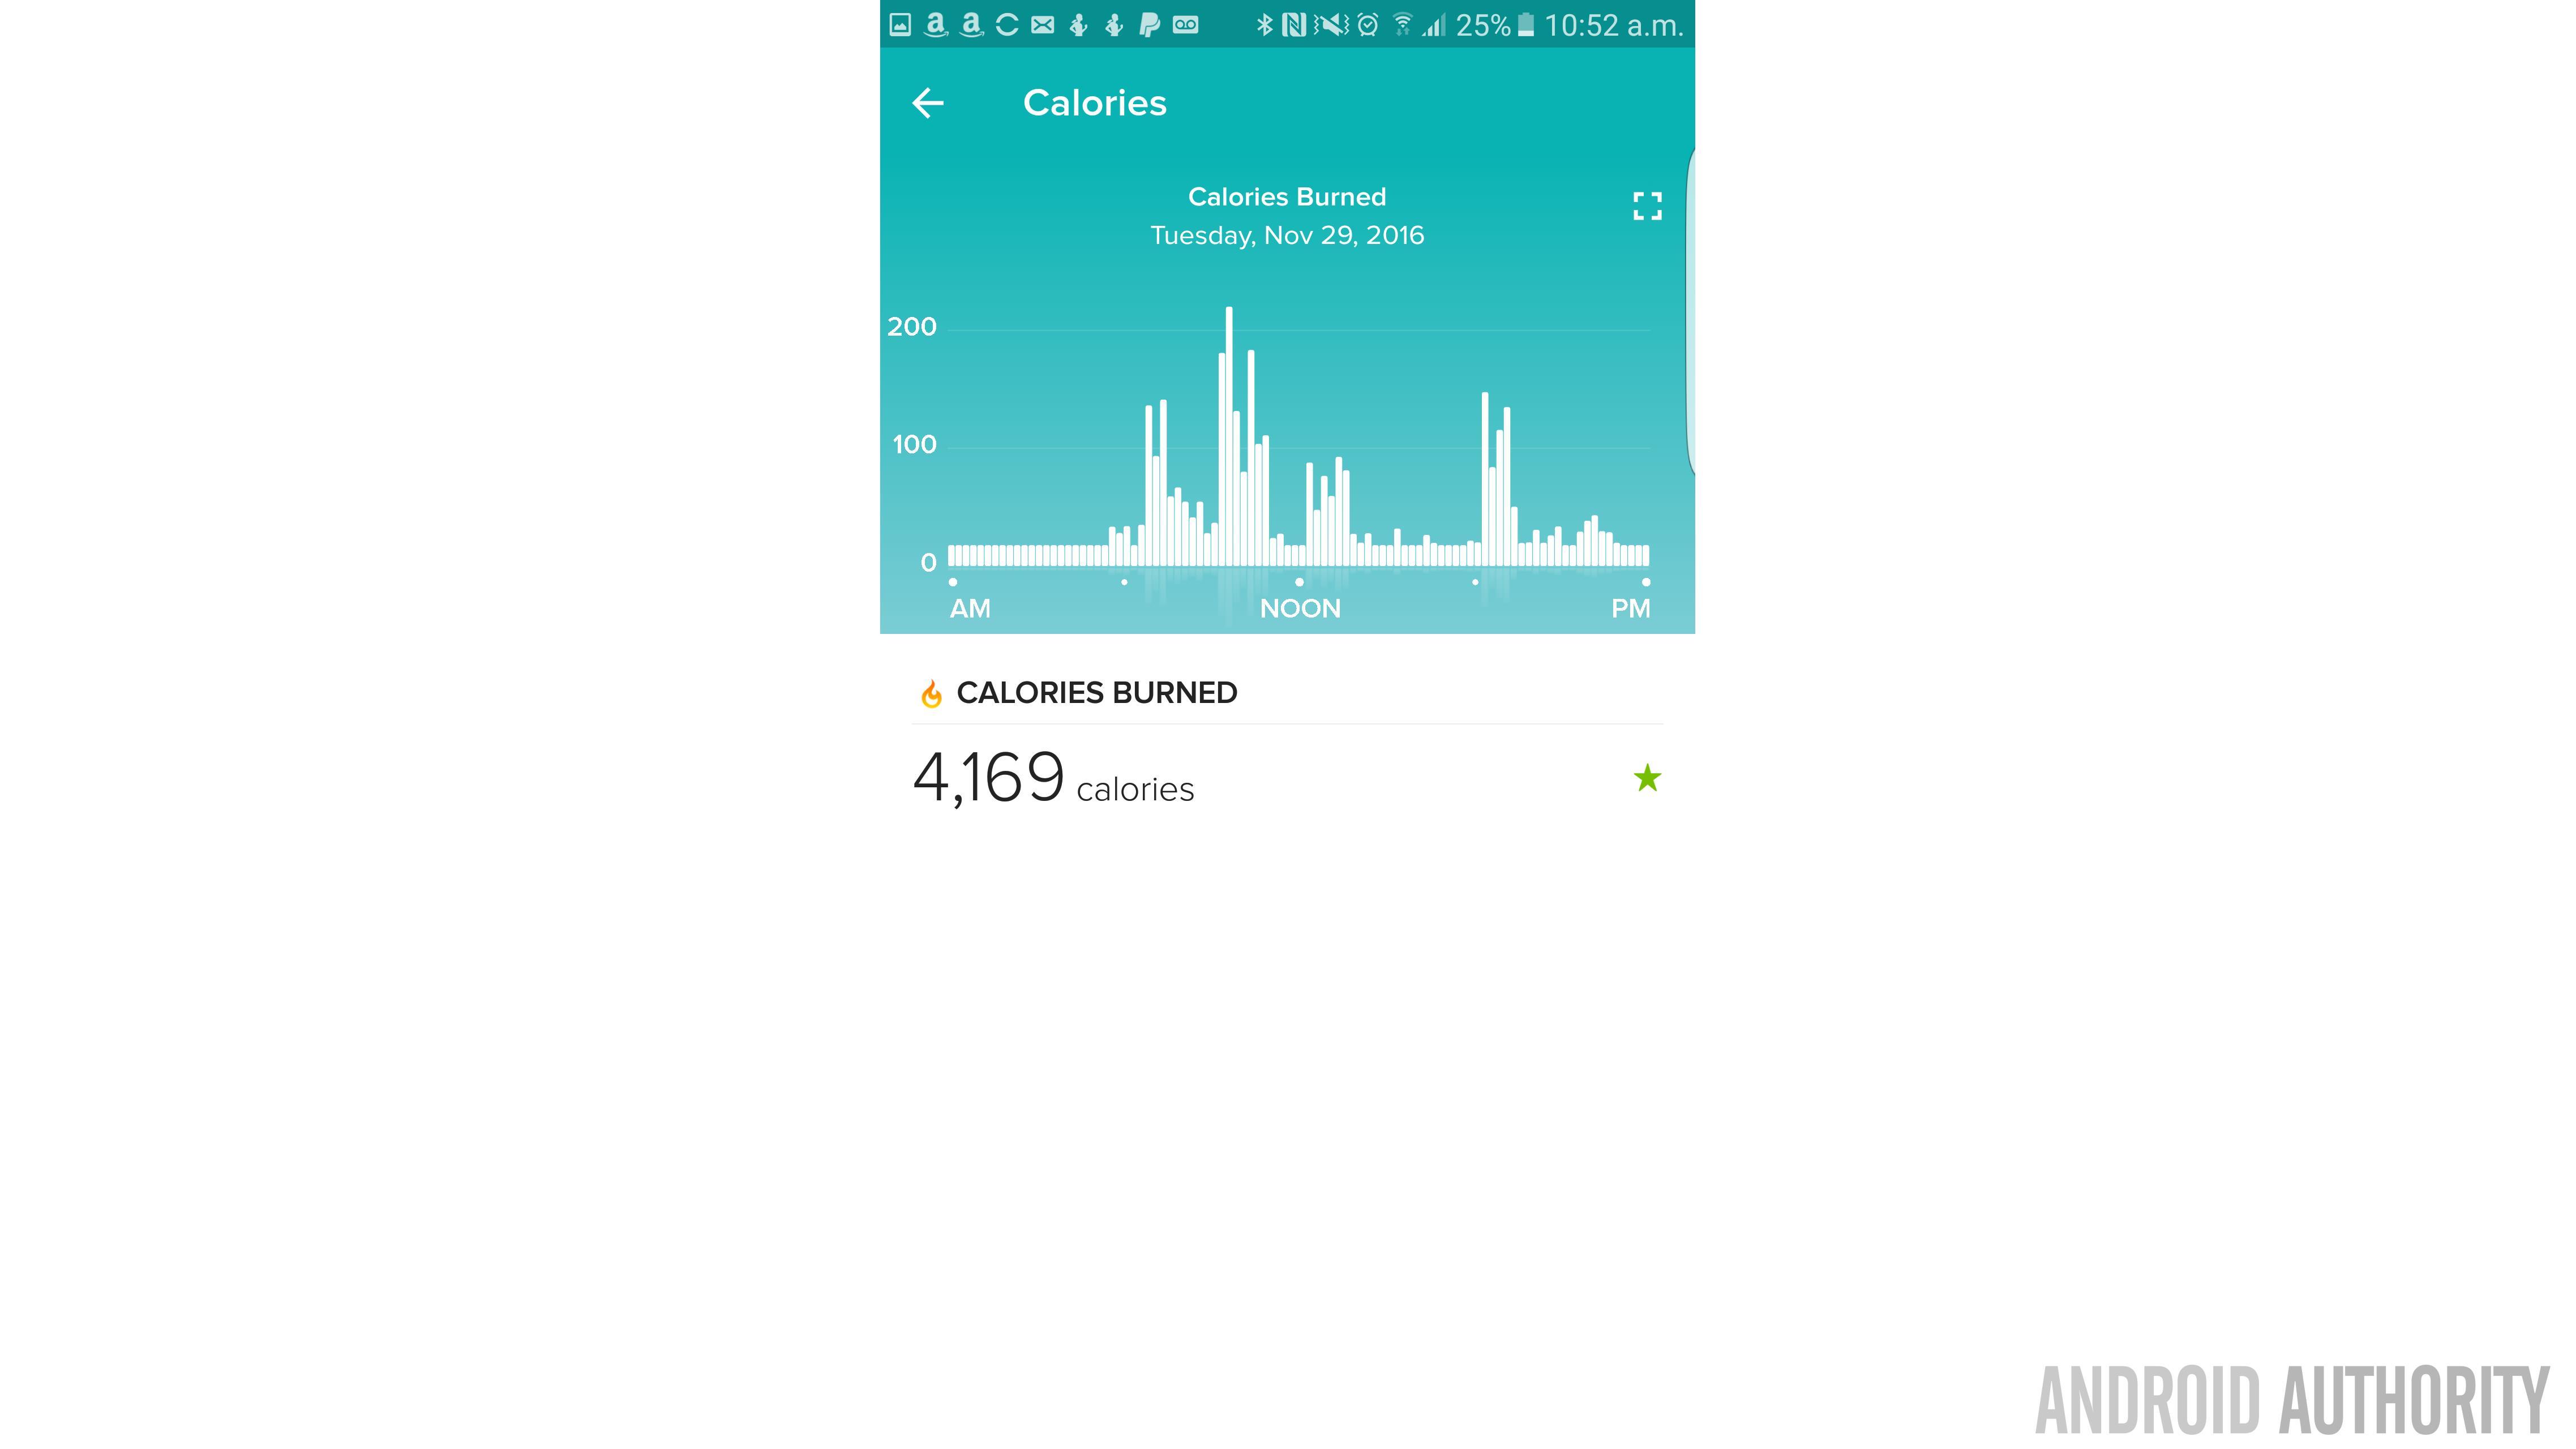 screenshot_20161208-105257-16x9